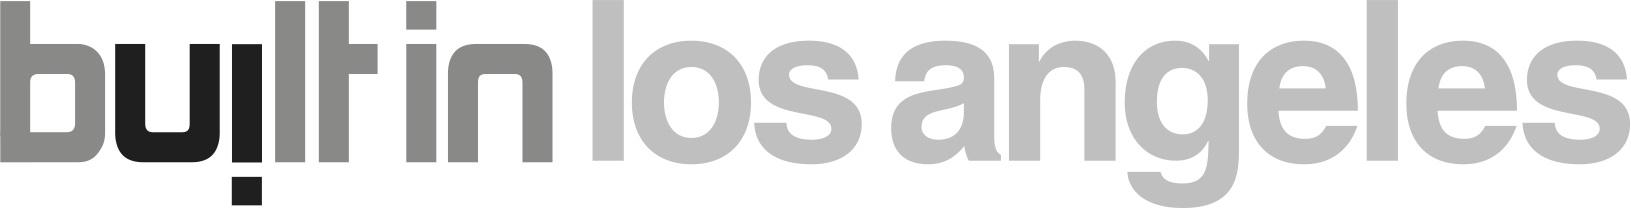 built_in_losangeles_logo_gray